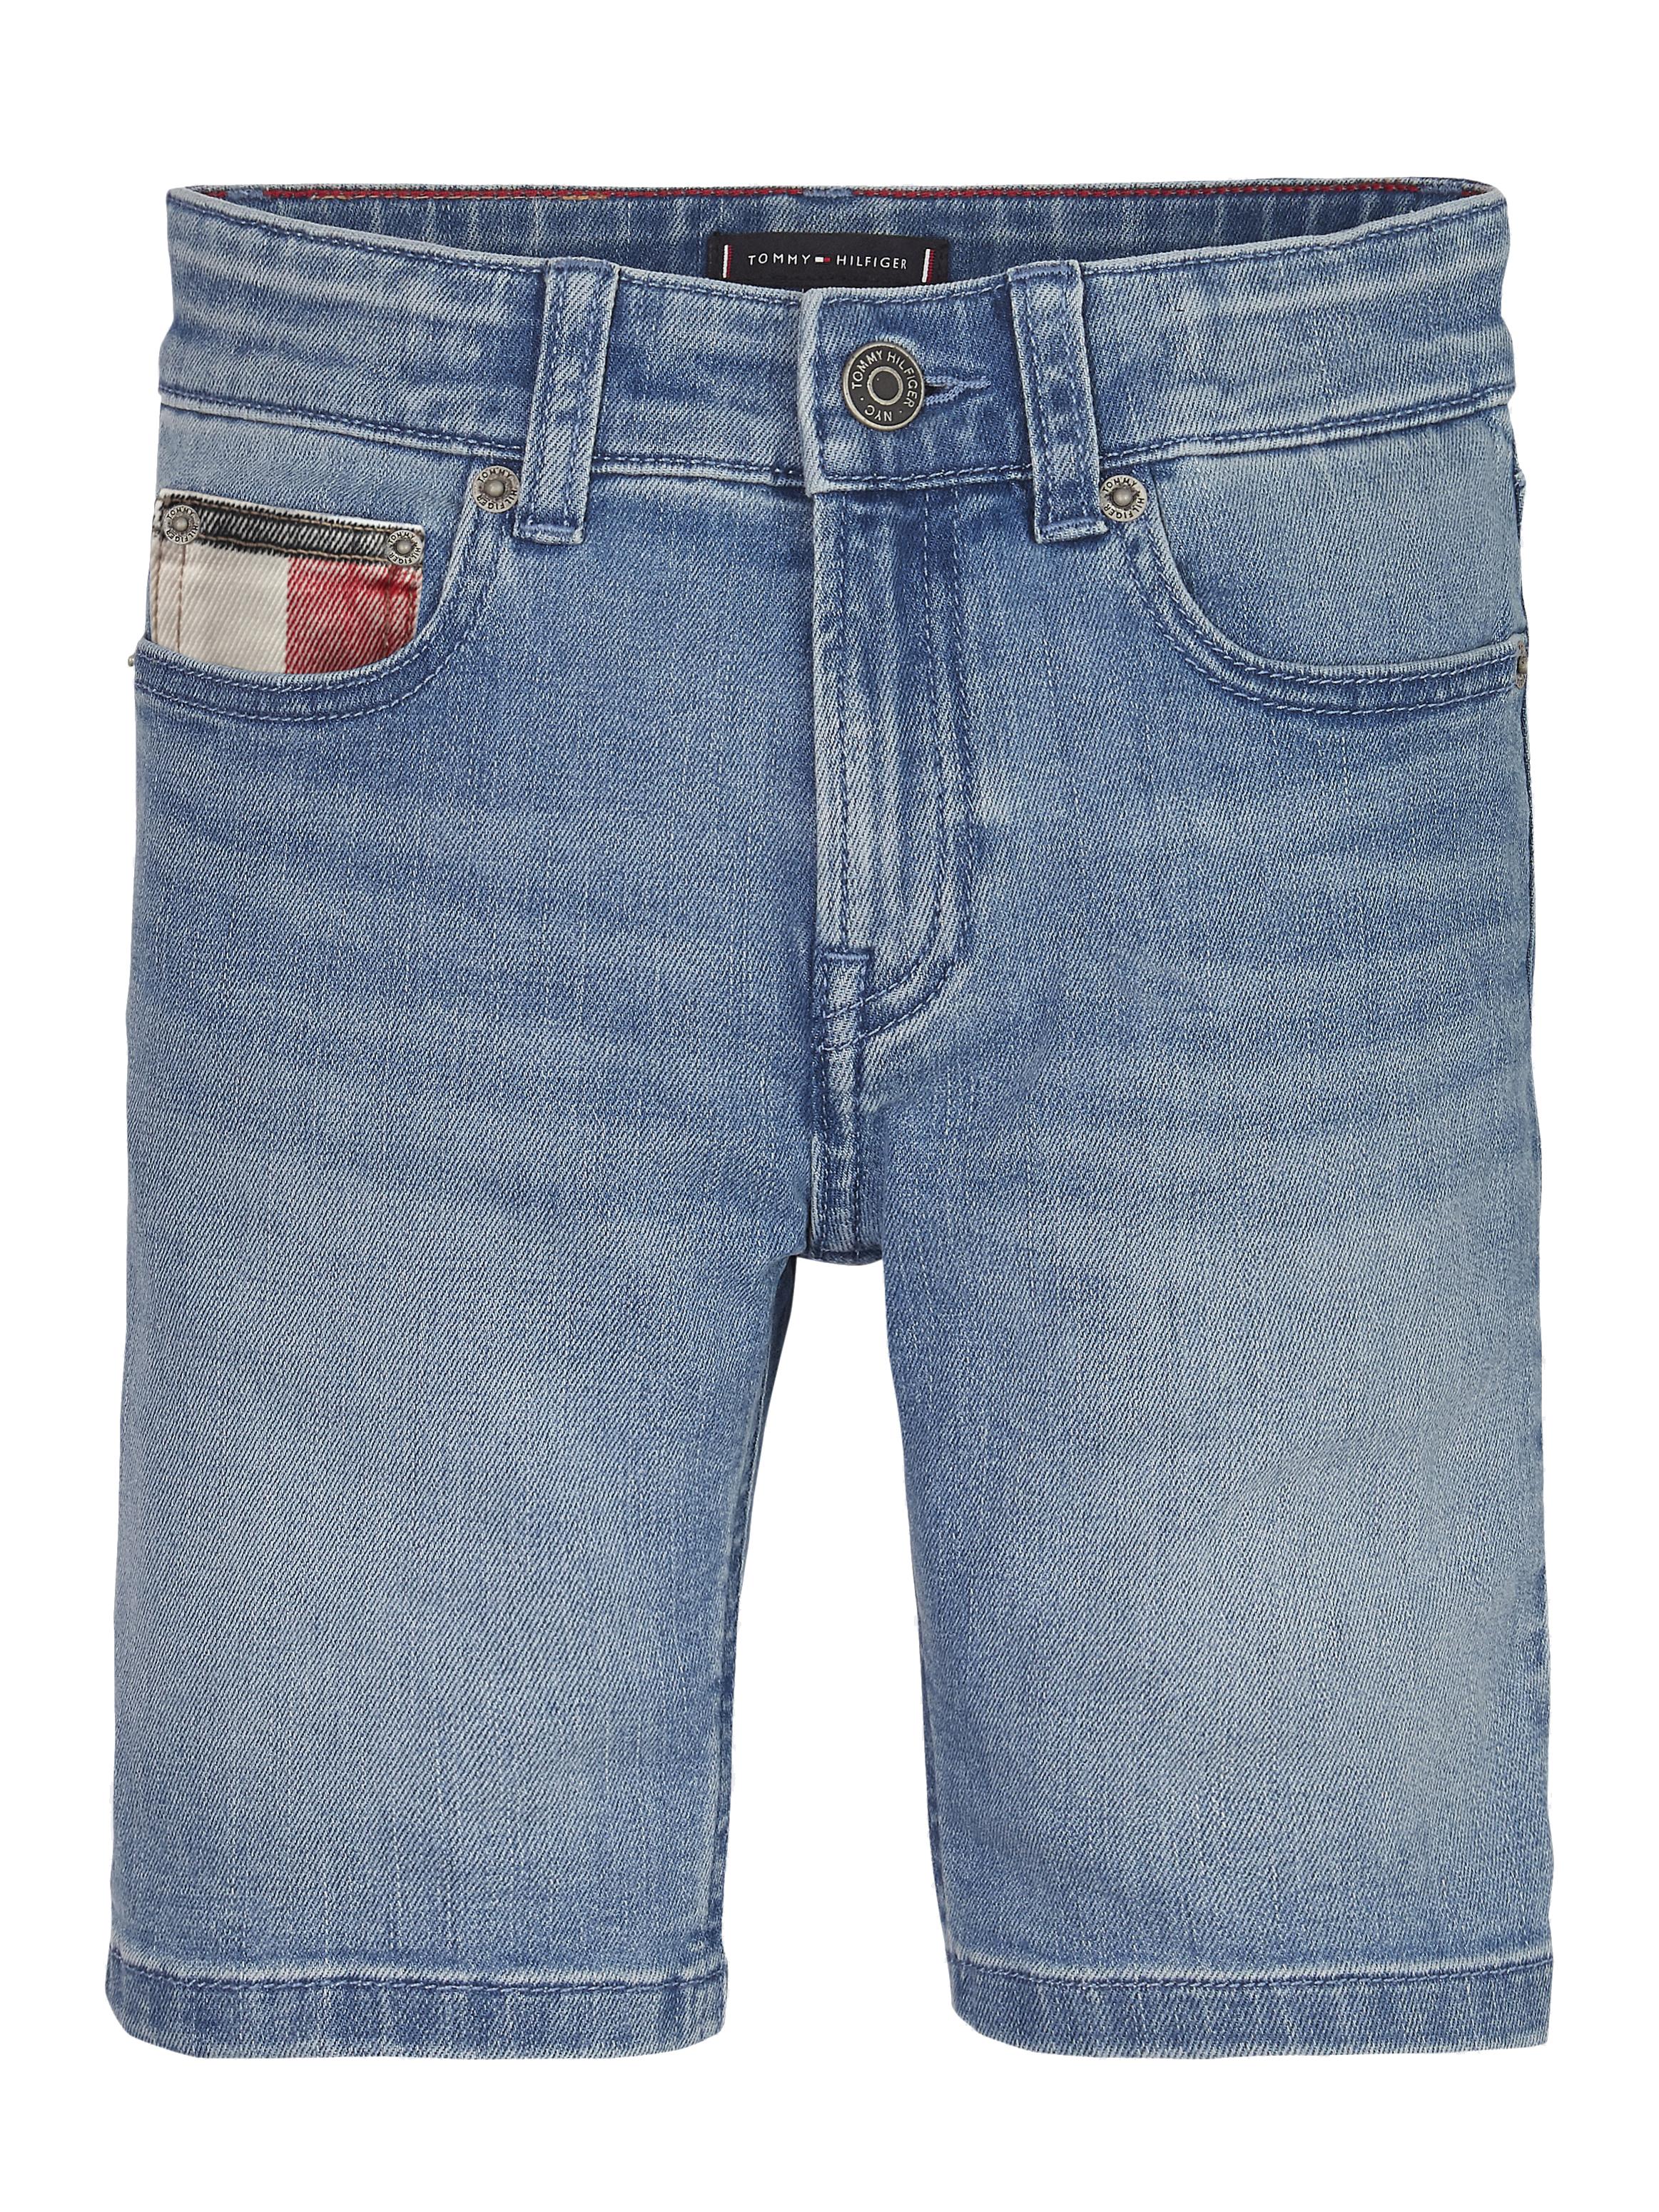 Pantalon Corto Nino Th Steve Shorts Oclbst Korner